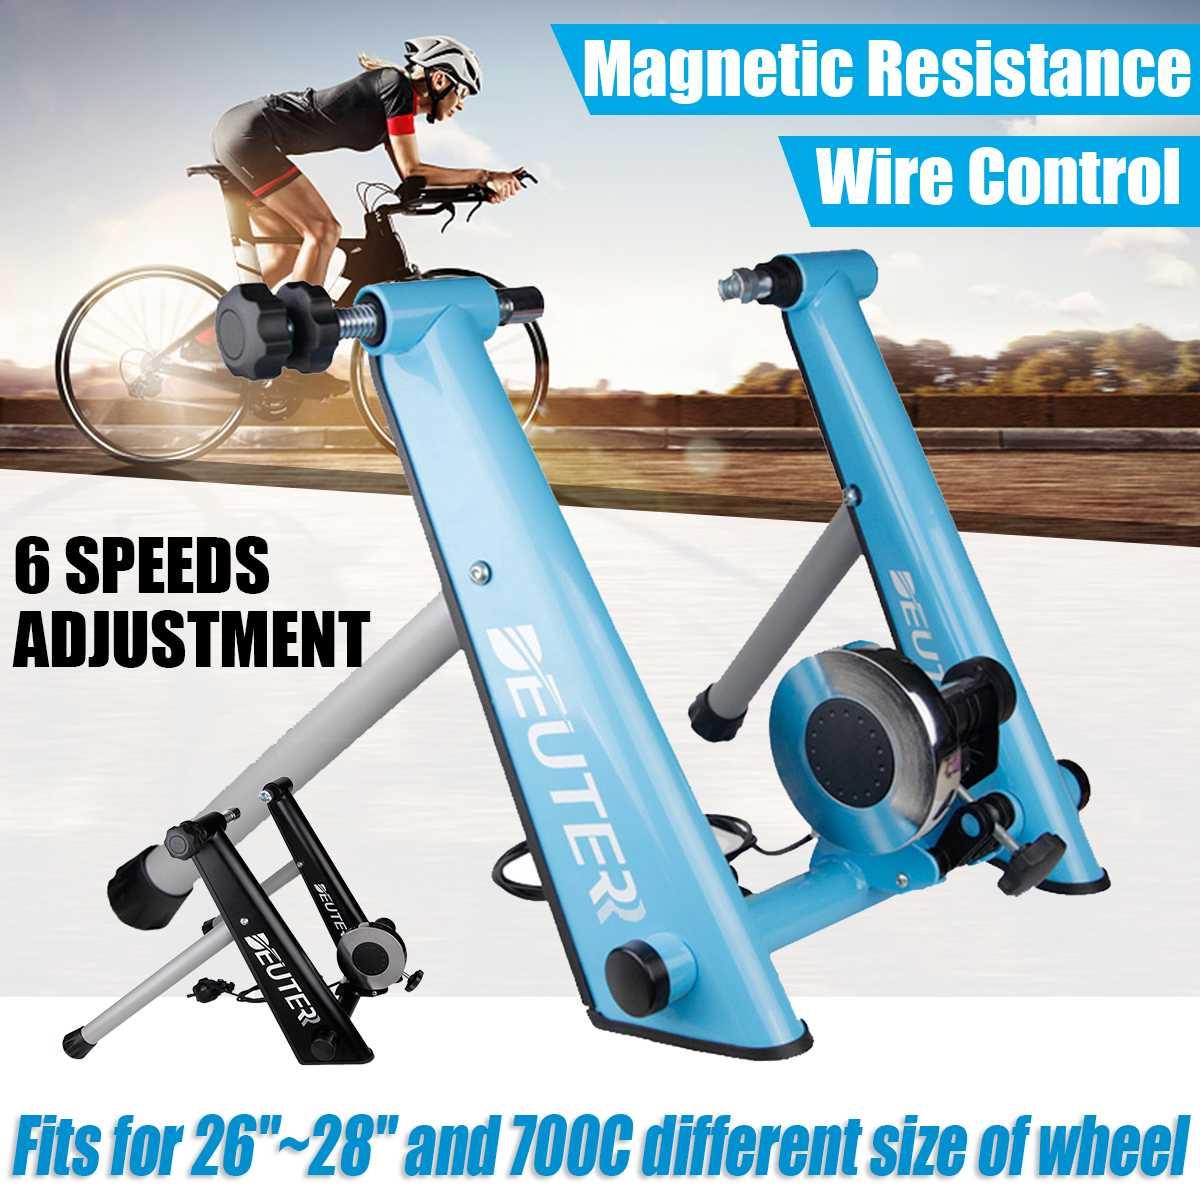 Entrenamiento para el hogar, bicicleta de ejercicios para interiores, entrenador de resistencia magnética de 6 velocidades, bicicleta de montaña o carretera